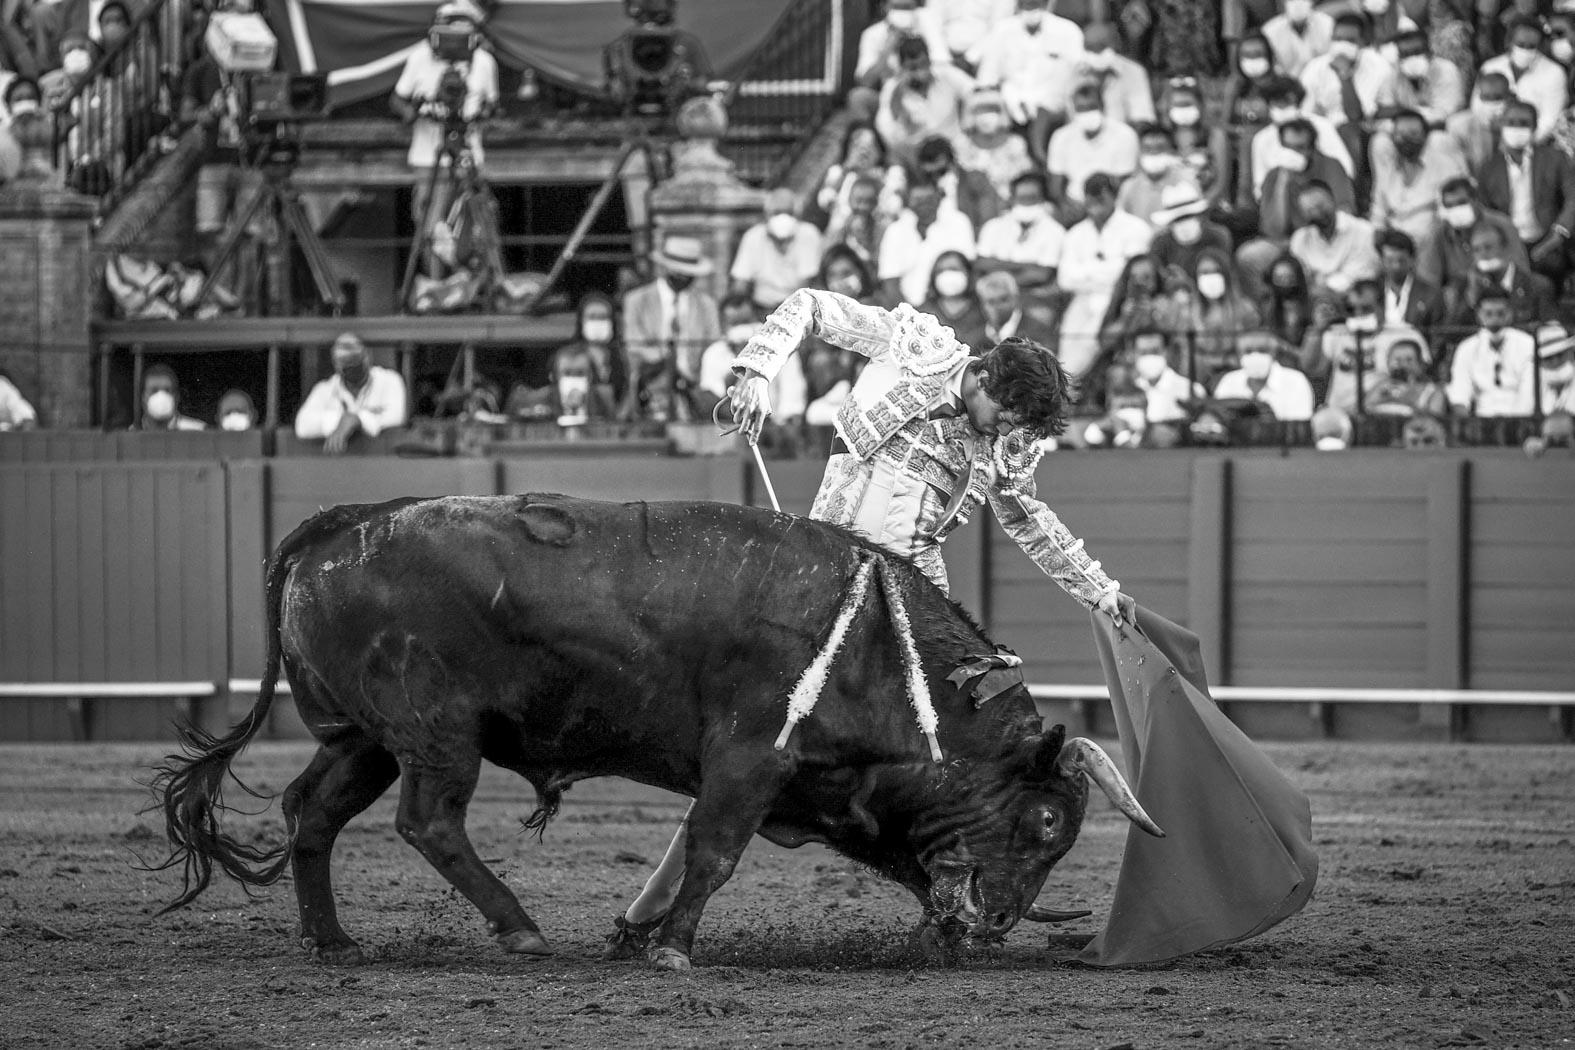 Fotografia de Roca Rey en Sevilla el 18 de septiembre de 2021